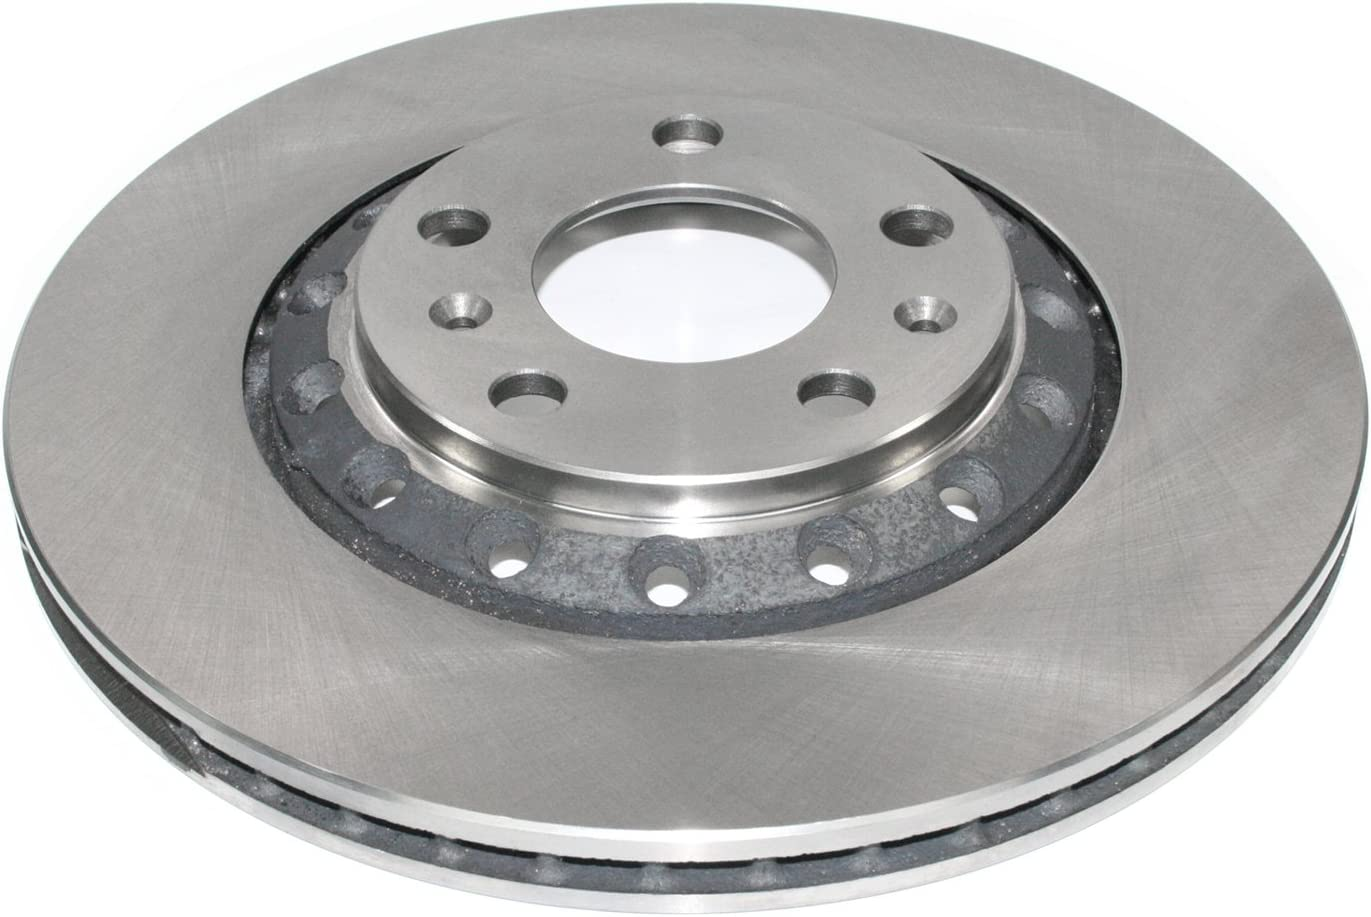 DuraGo BR901212 Rear Vented Disc Brake Rotor